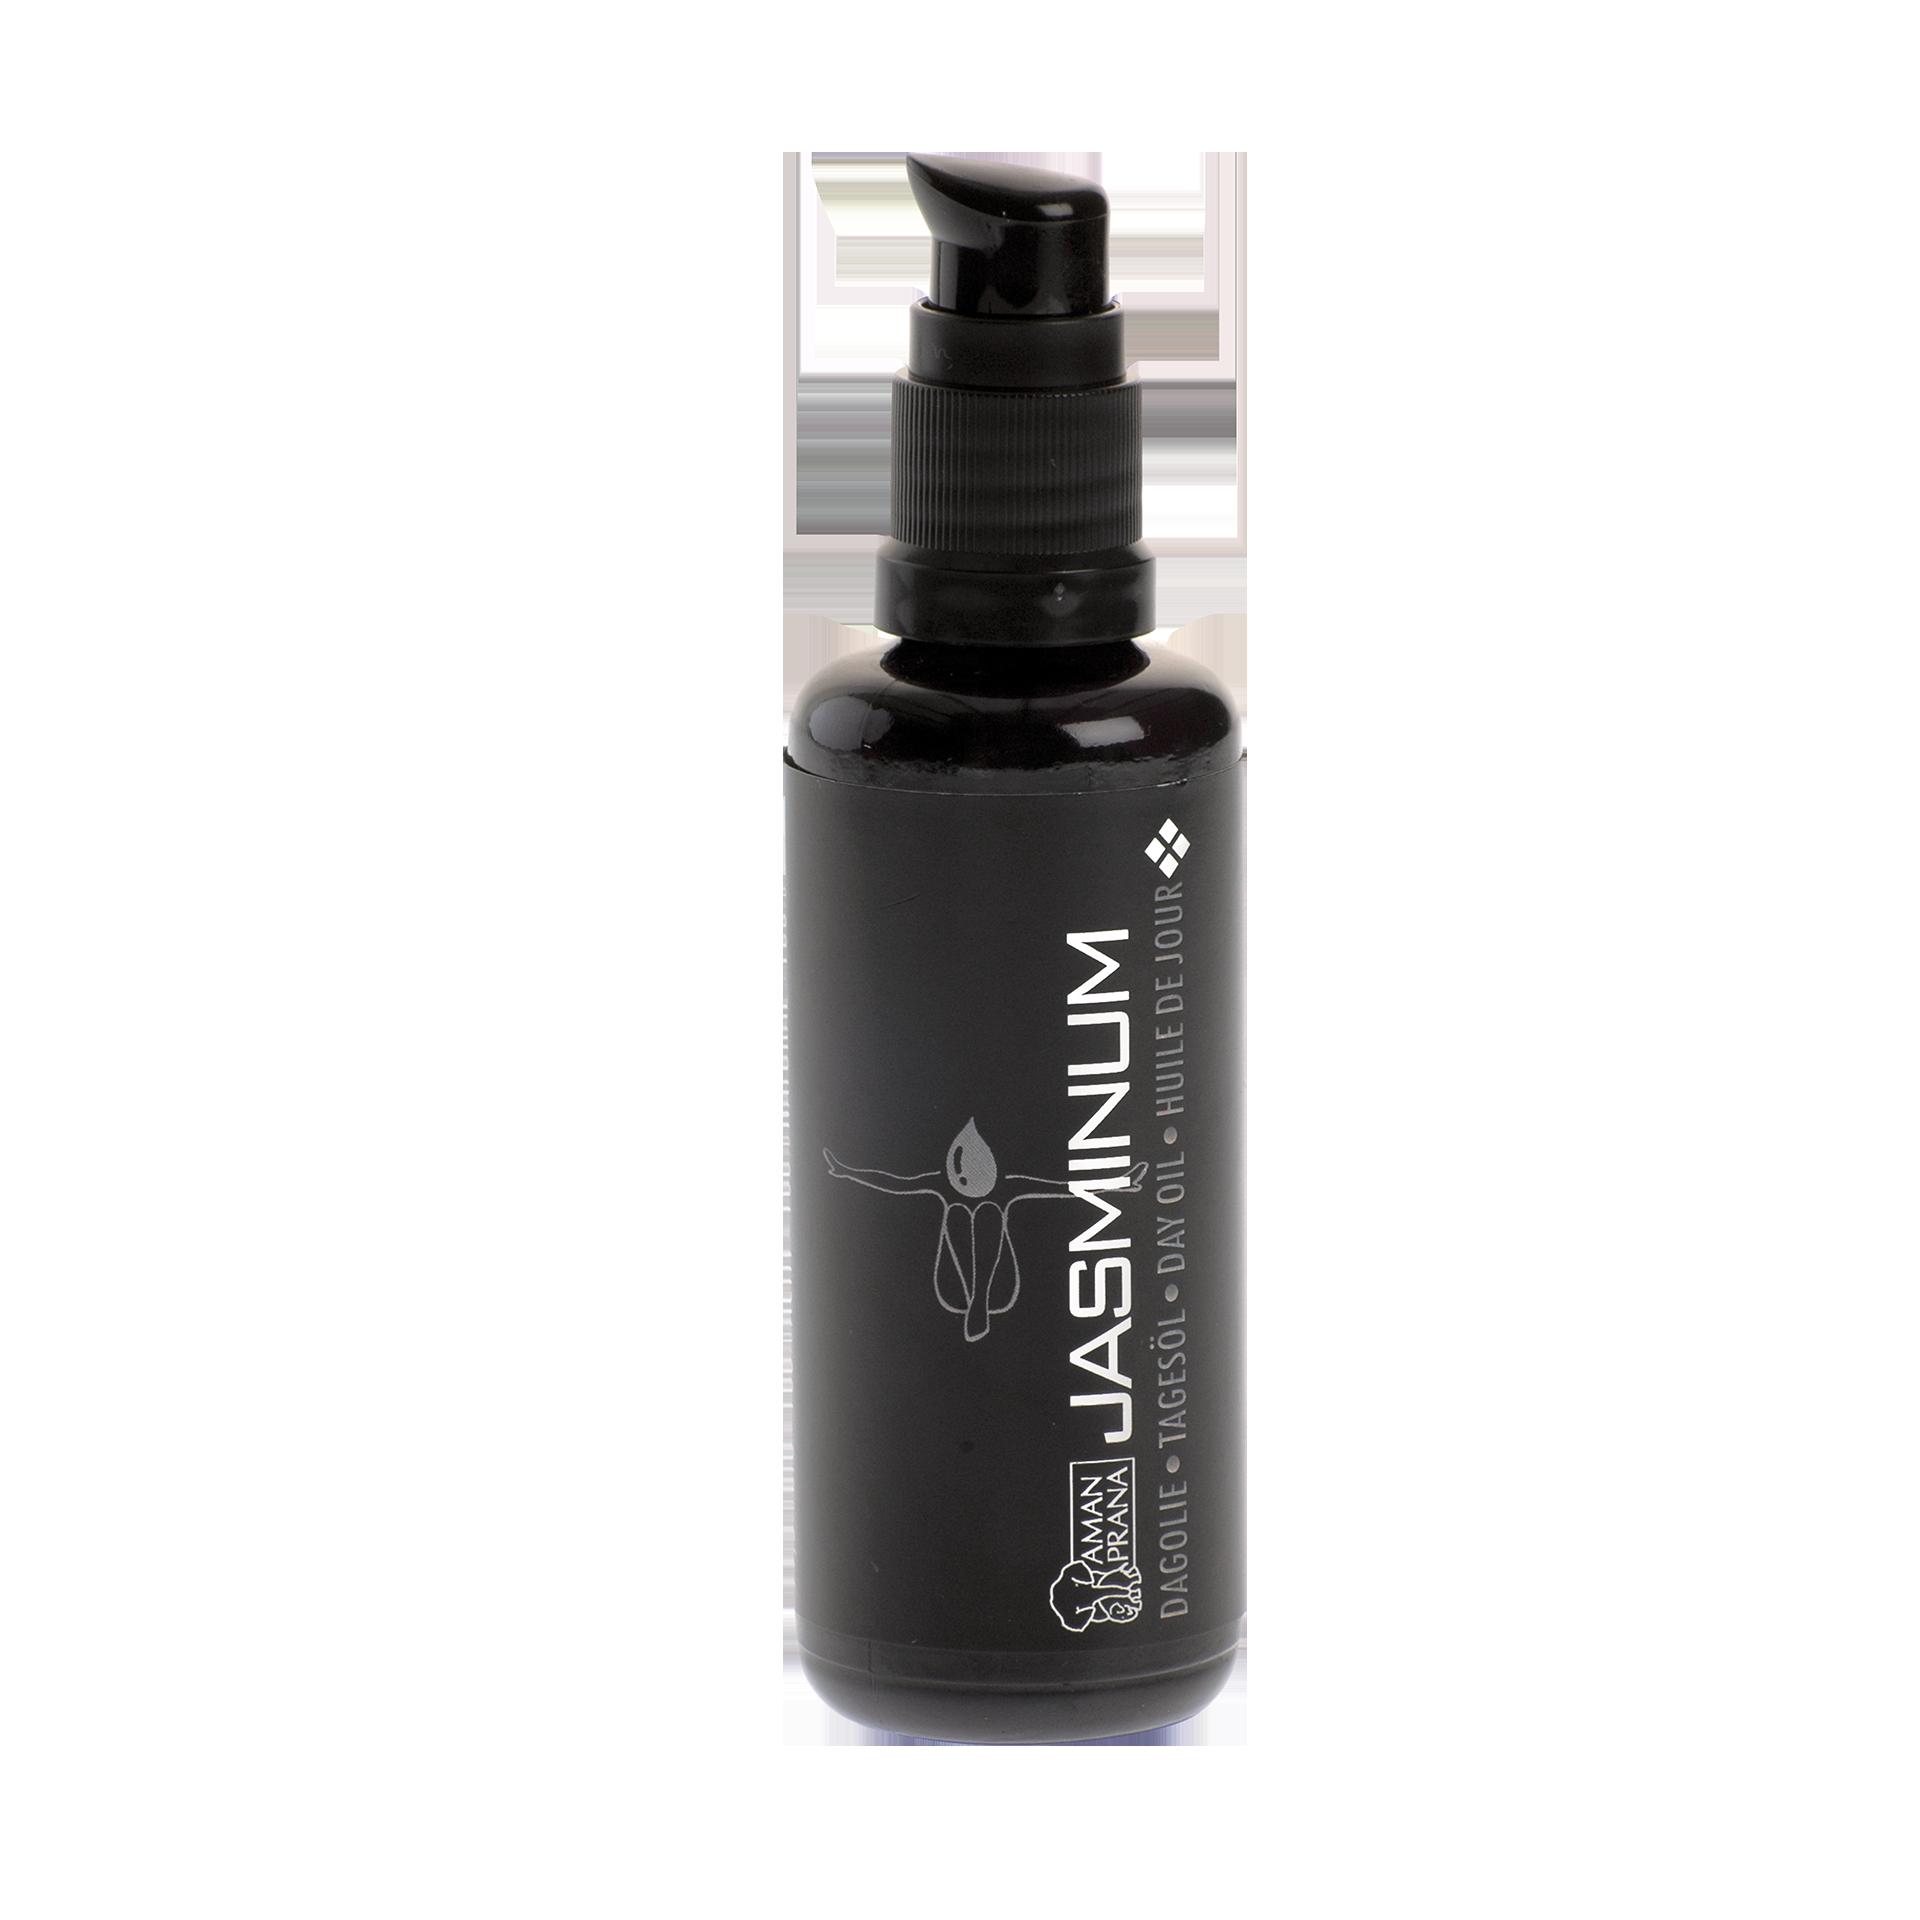 Tagesöl Jasminum, 50 ml